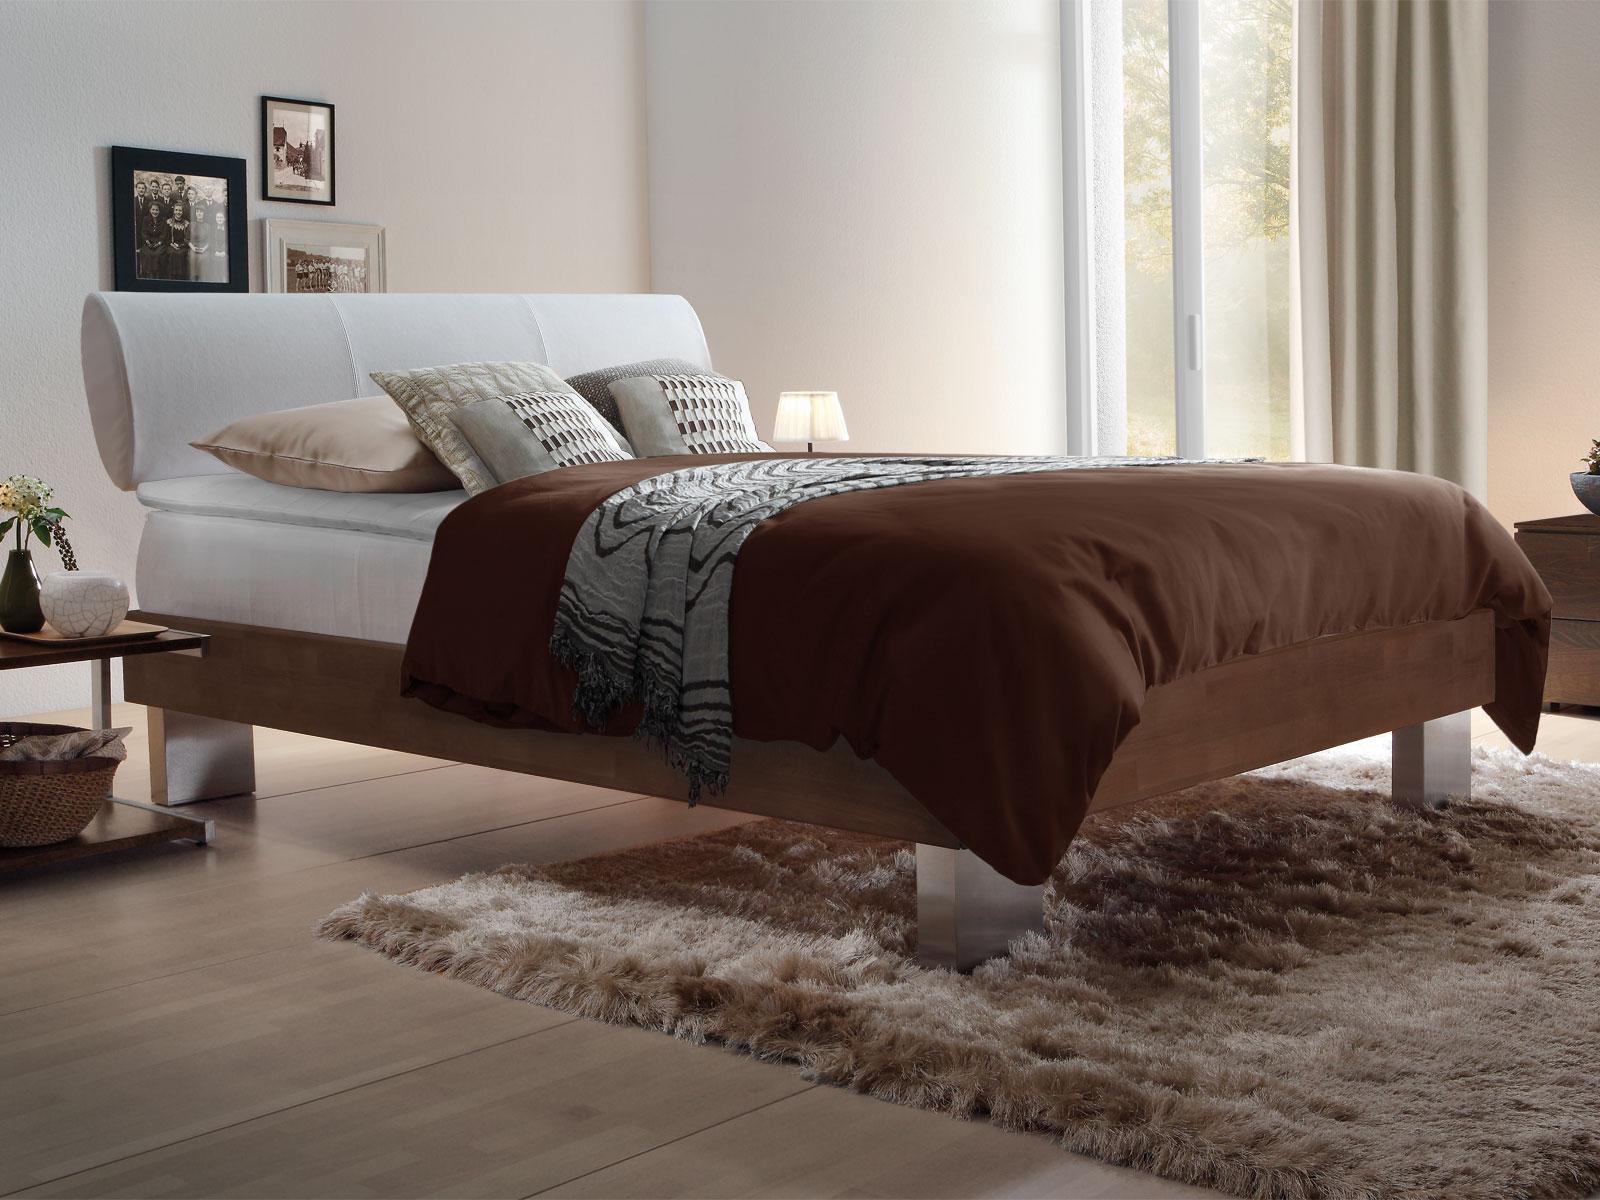 boxspringbett mit bettrahmen aus massivholz und topper cameron. Black Bedroom Furniture Sets. Home Design Ideas